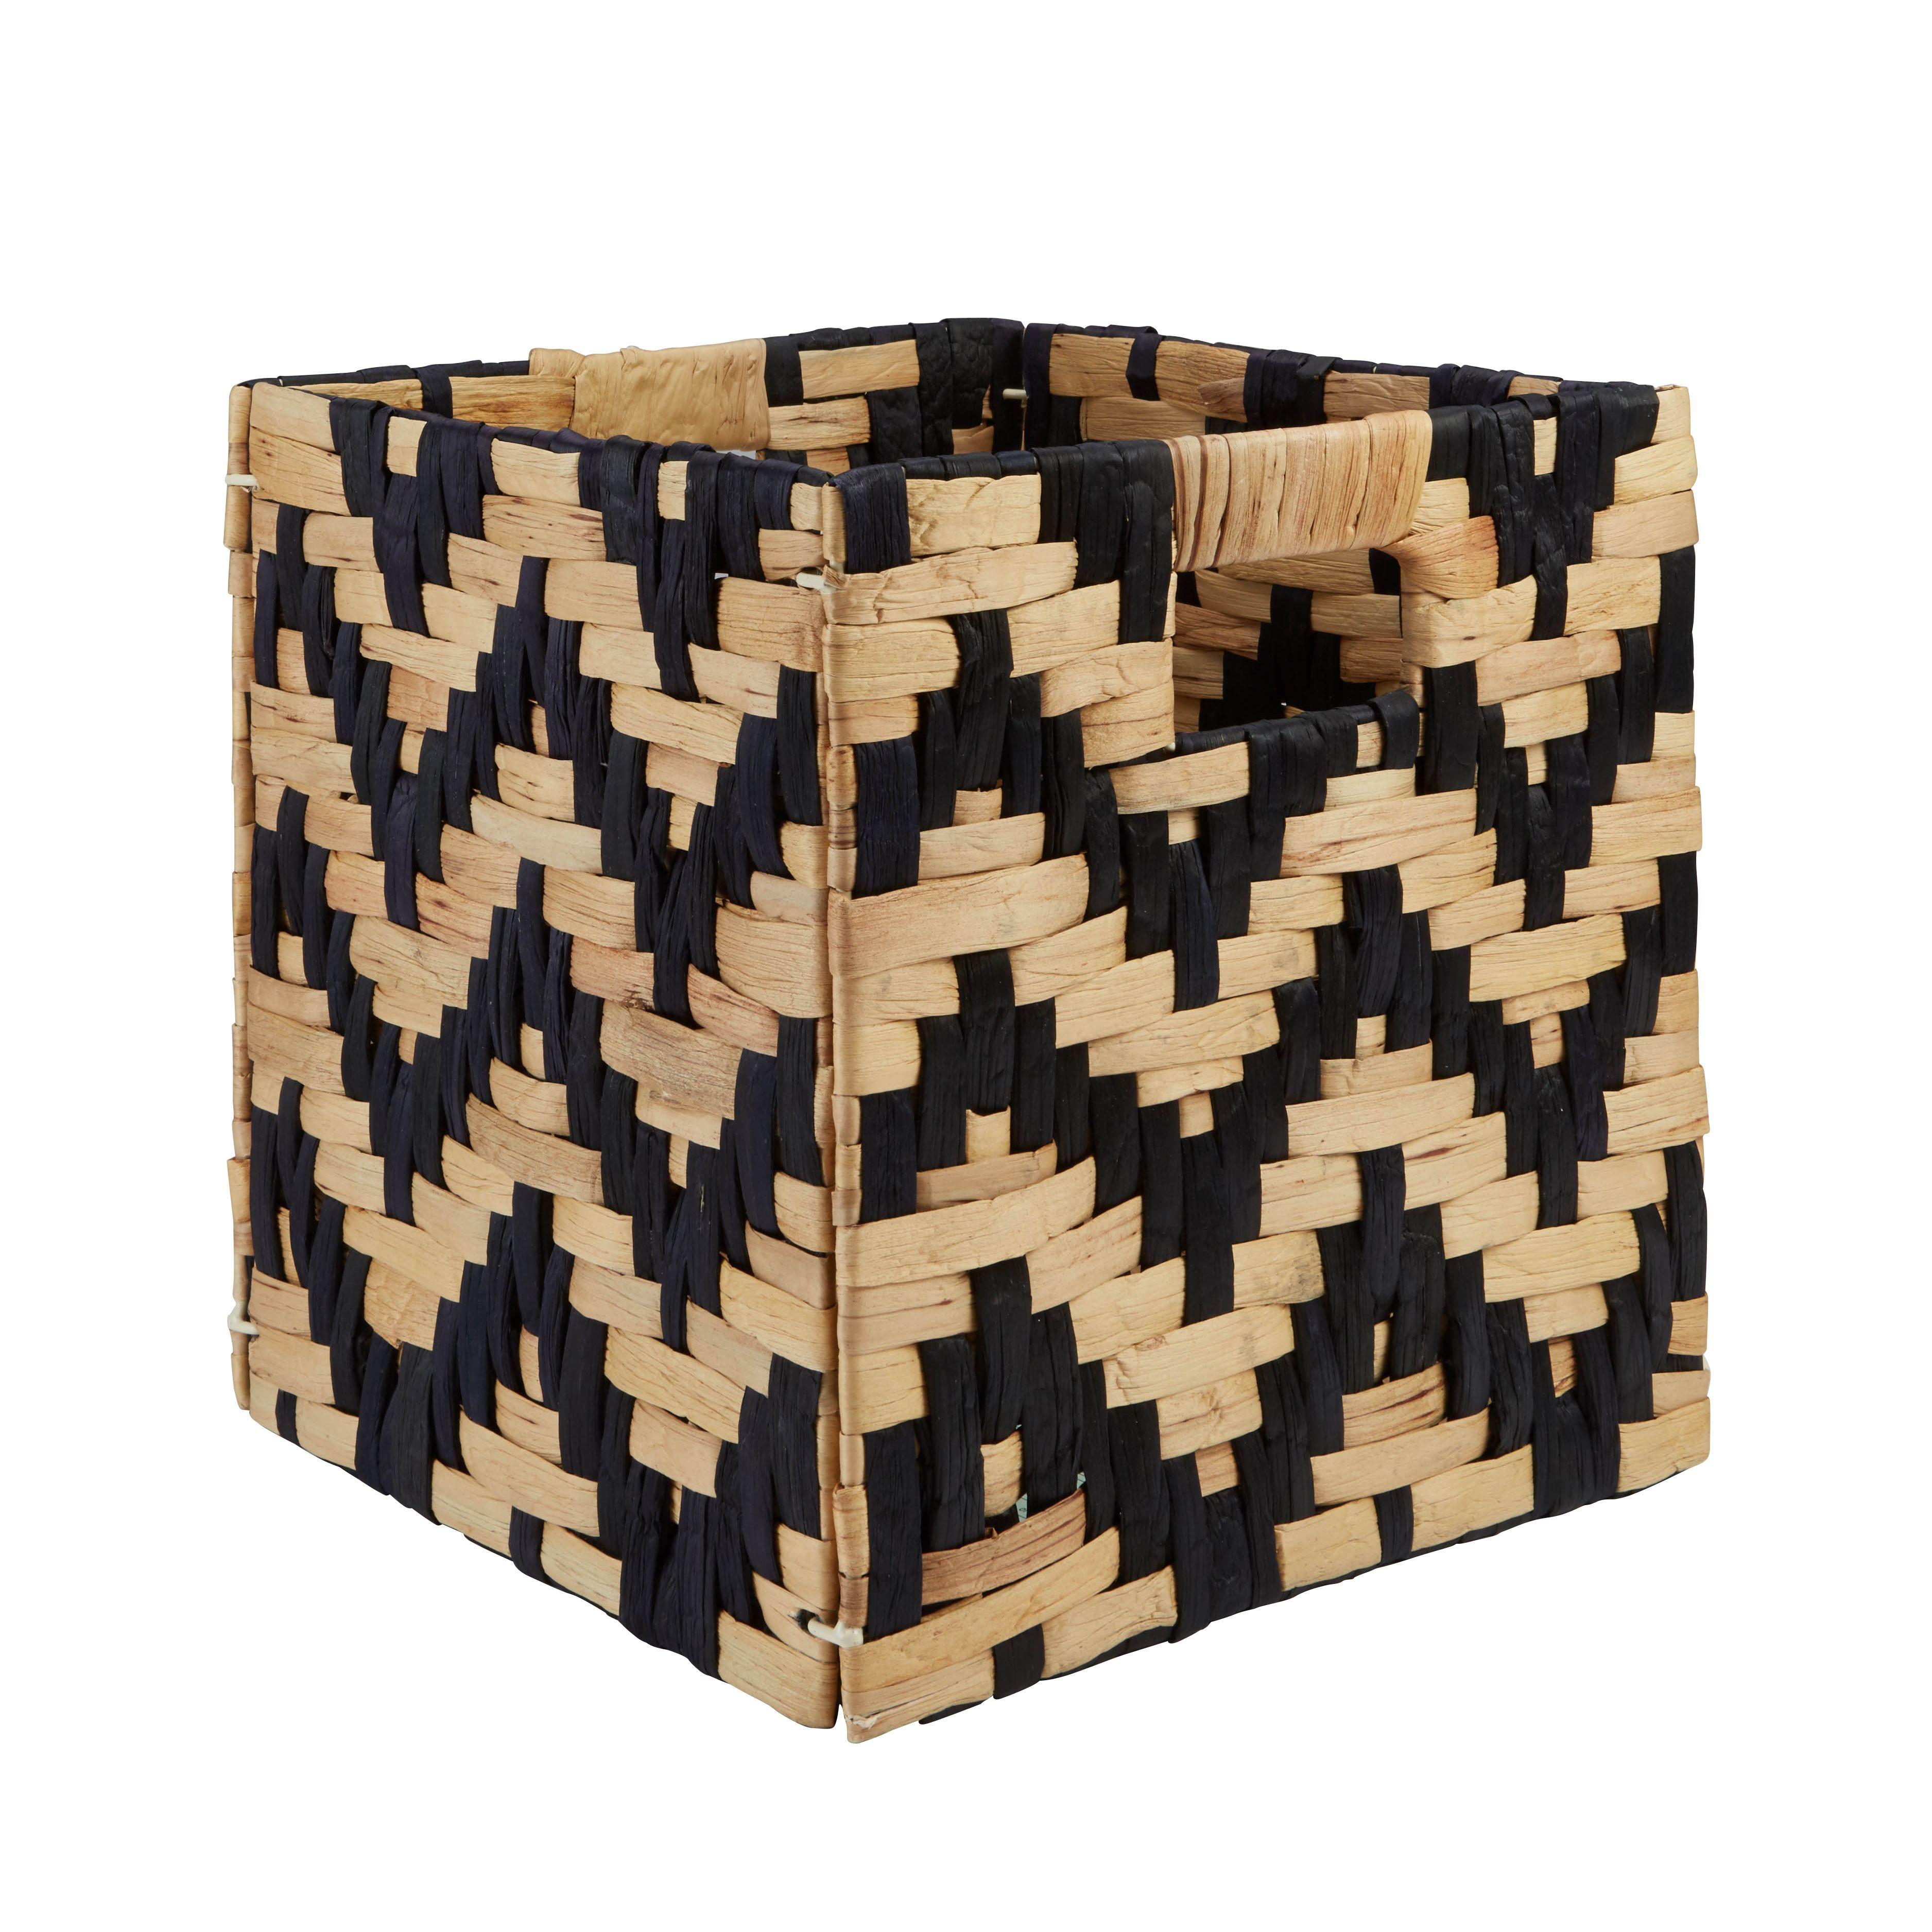 Mixxit Natural & Black Chevron Storage Cube Basket (w)310mm (l)310 Mm